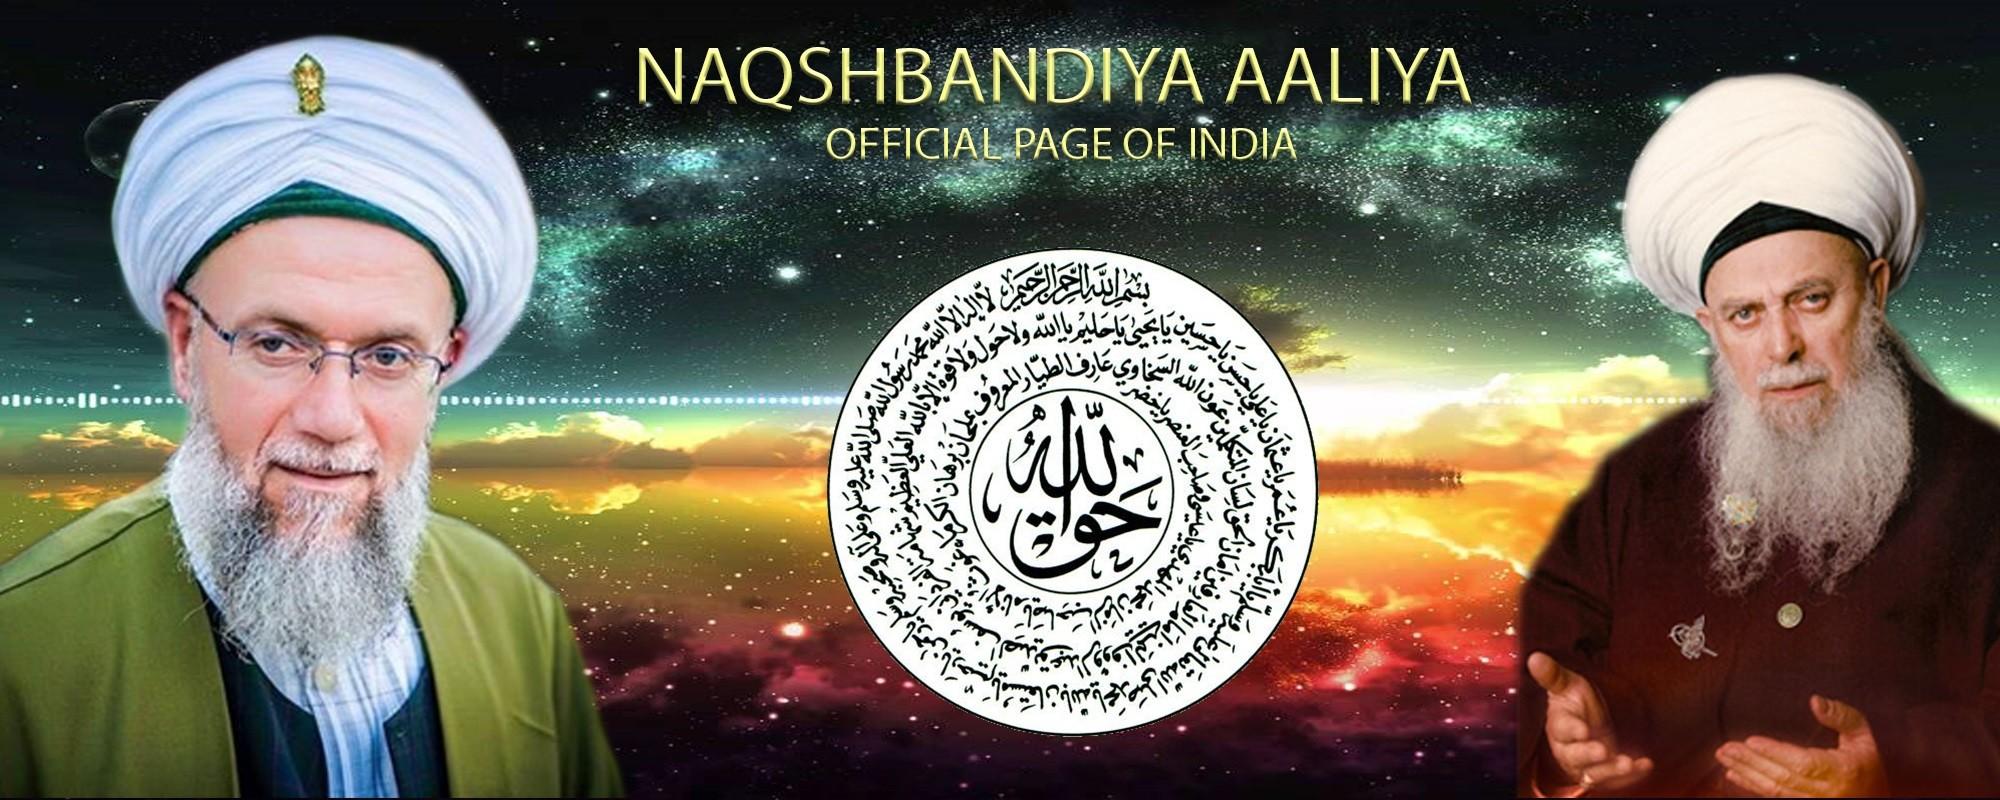 Naqshbandiyya Aaliya – India